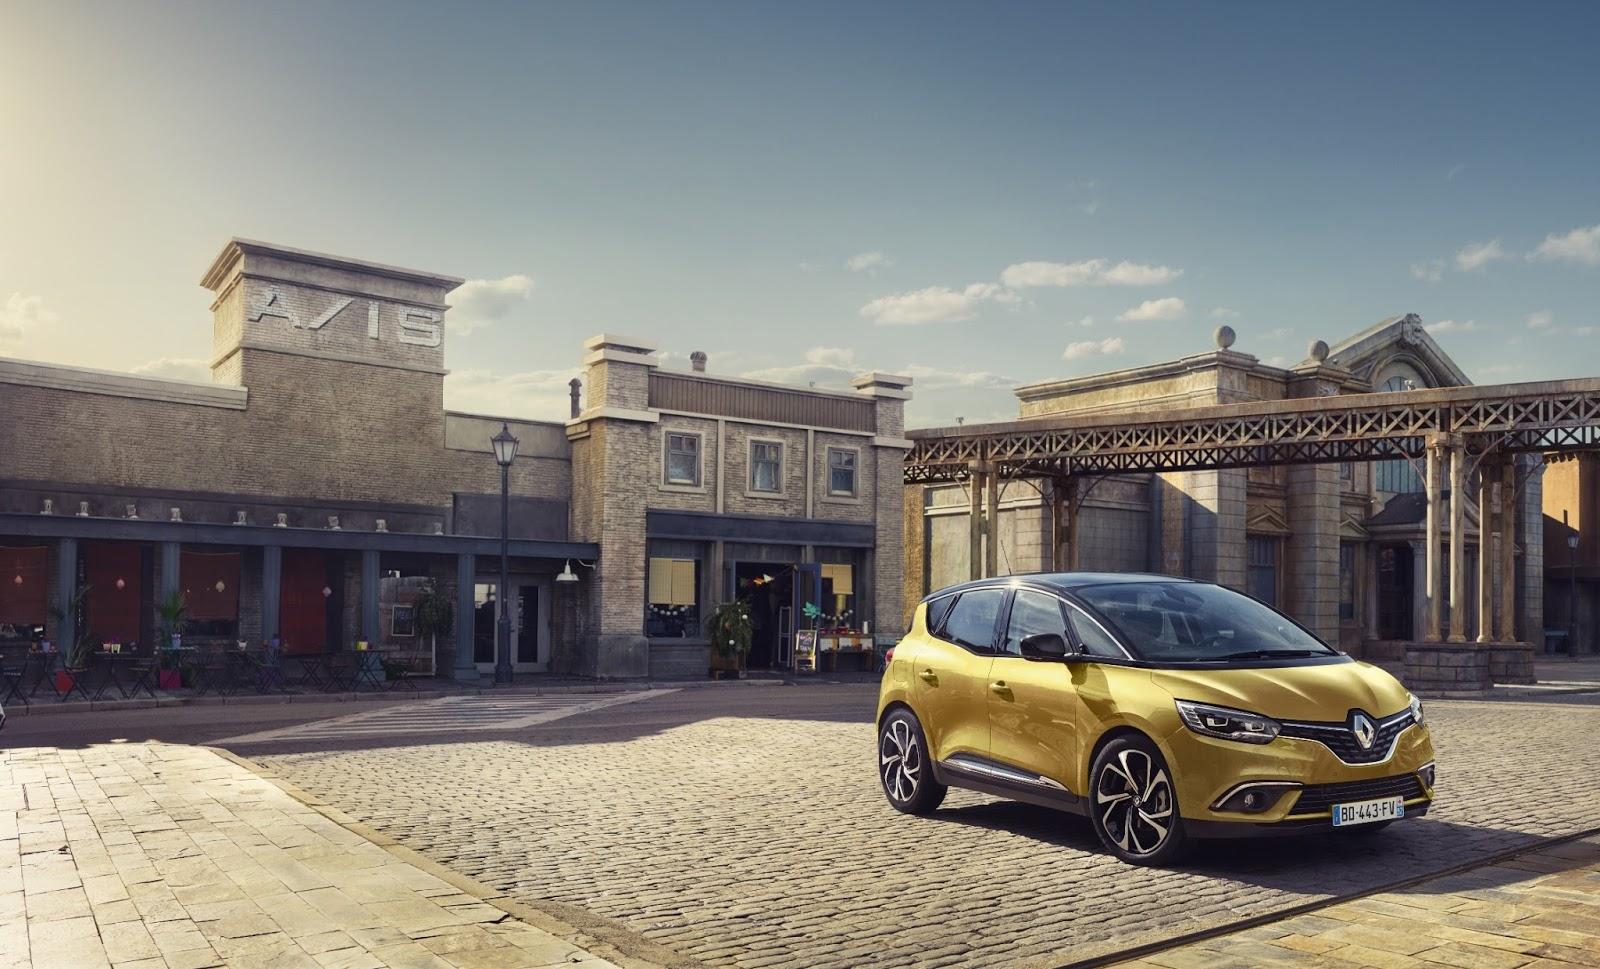 00097510 l Η Renault αποκαλύπτει το νέο Renault Scenic και Renault Megane Estate 86η Έκθεση Γενεύης, autoshow, MPV, Renault, Renault Megane Estate, Renault Scenic, Station Wagon